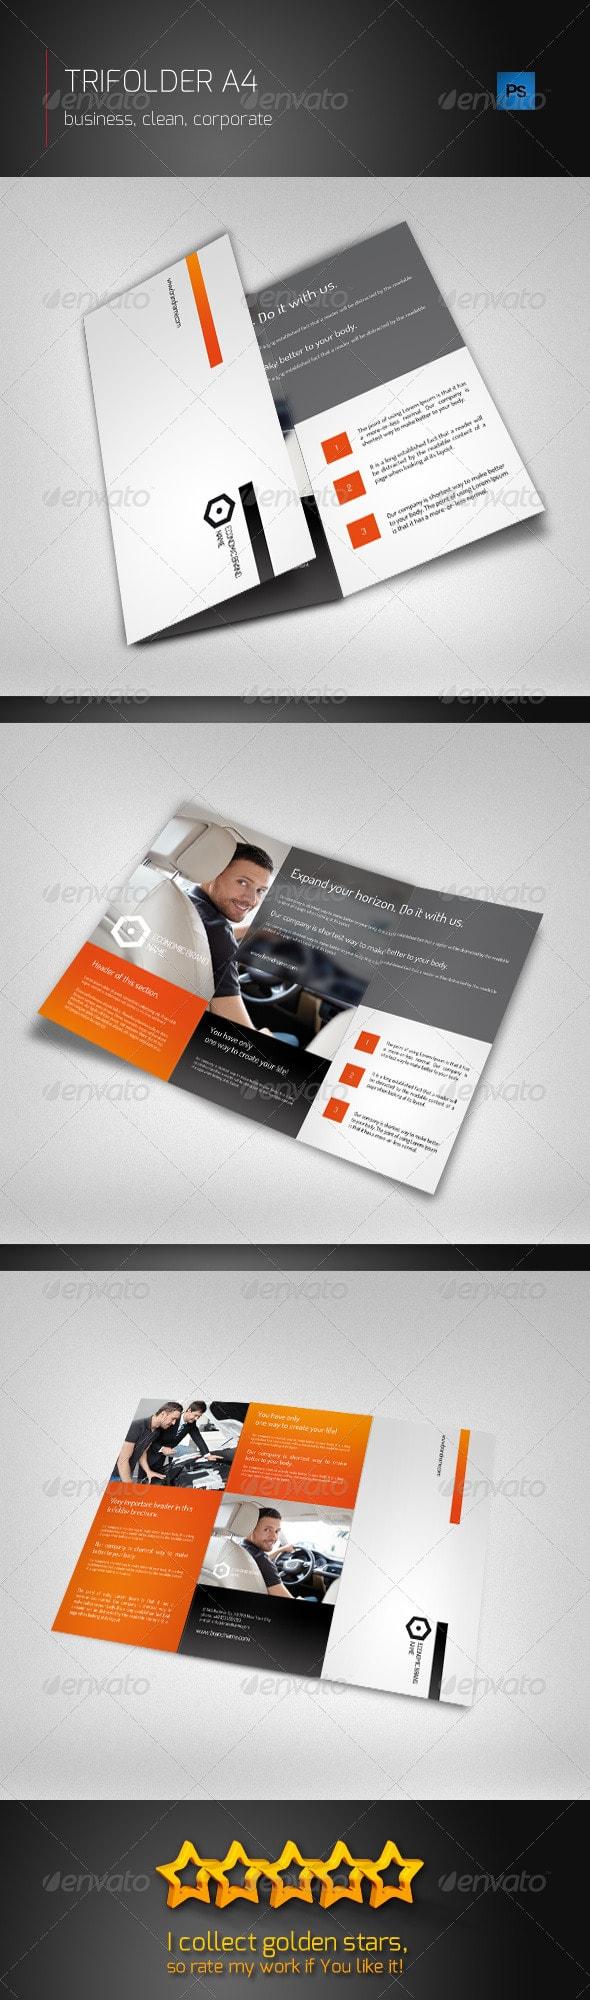 Trifolder Business Brochure